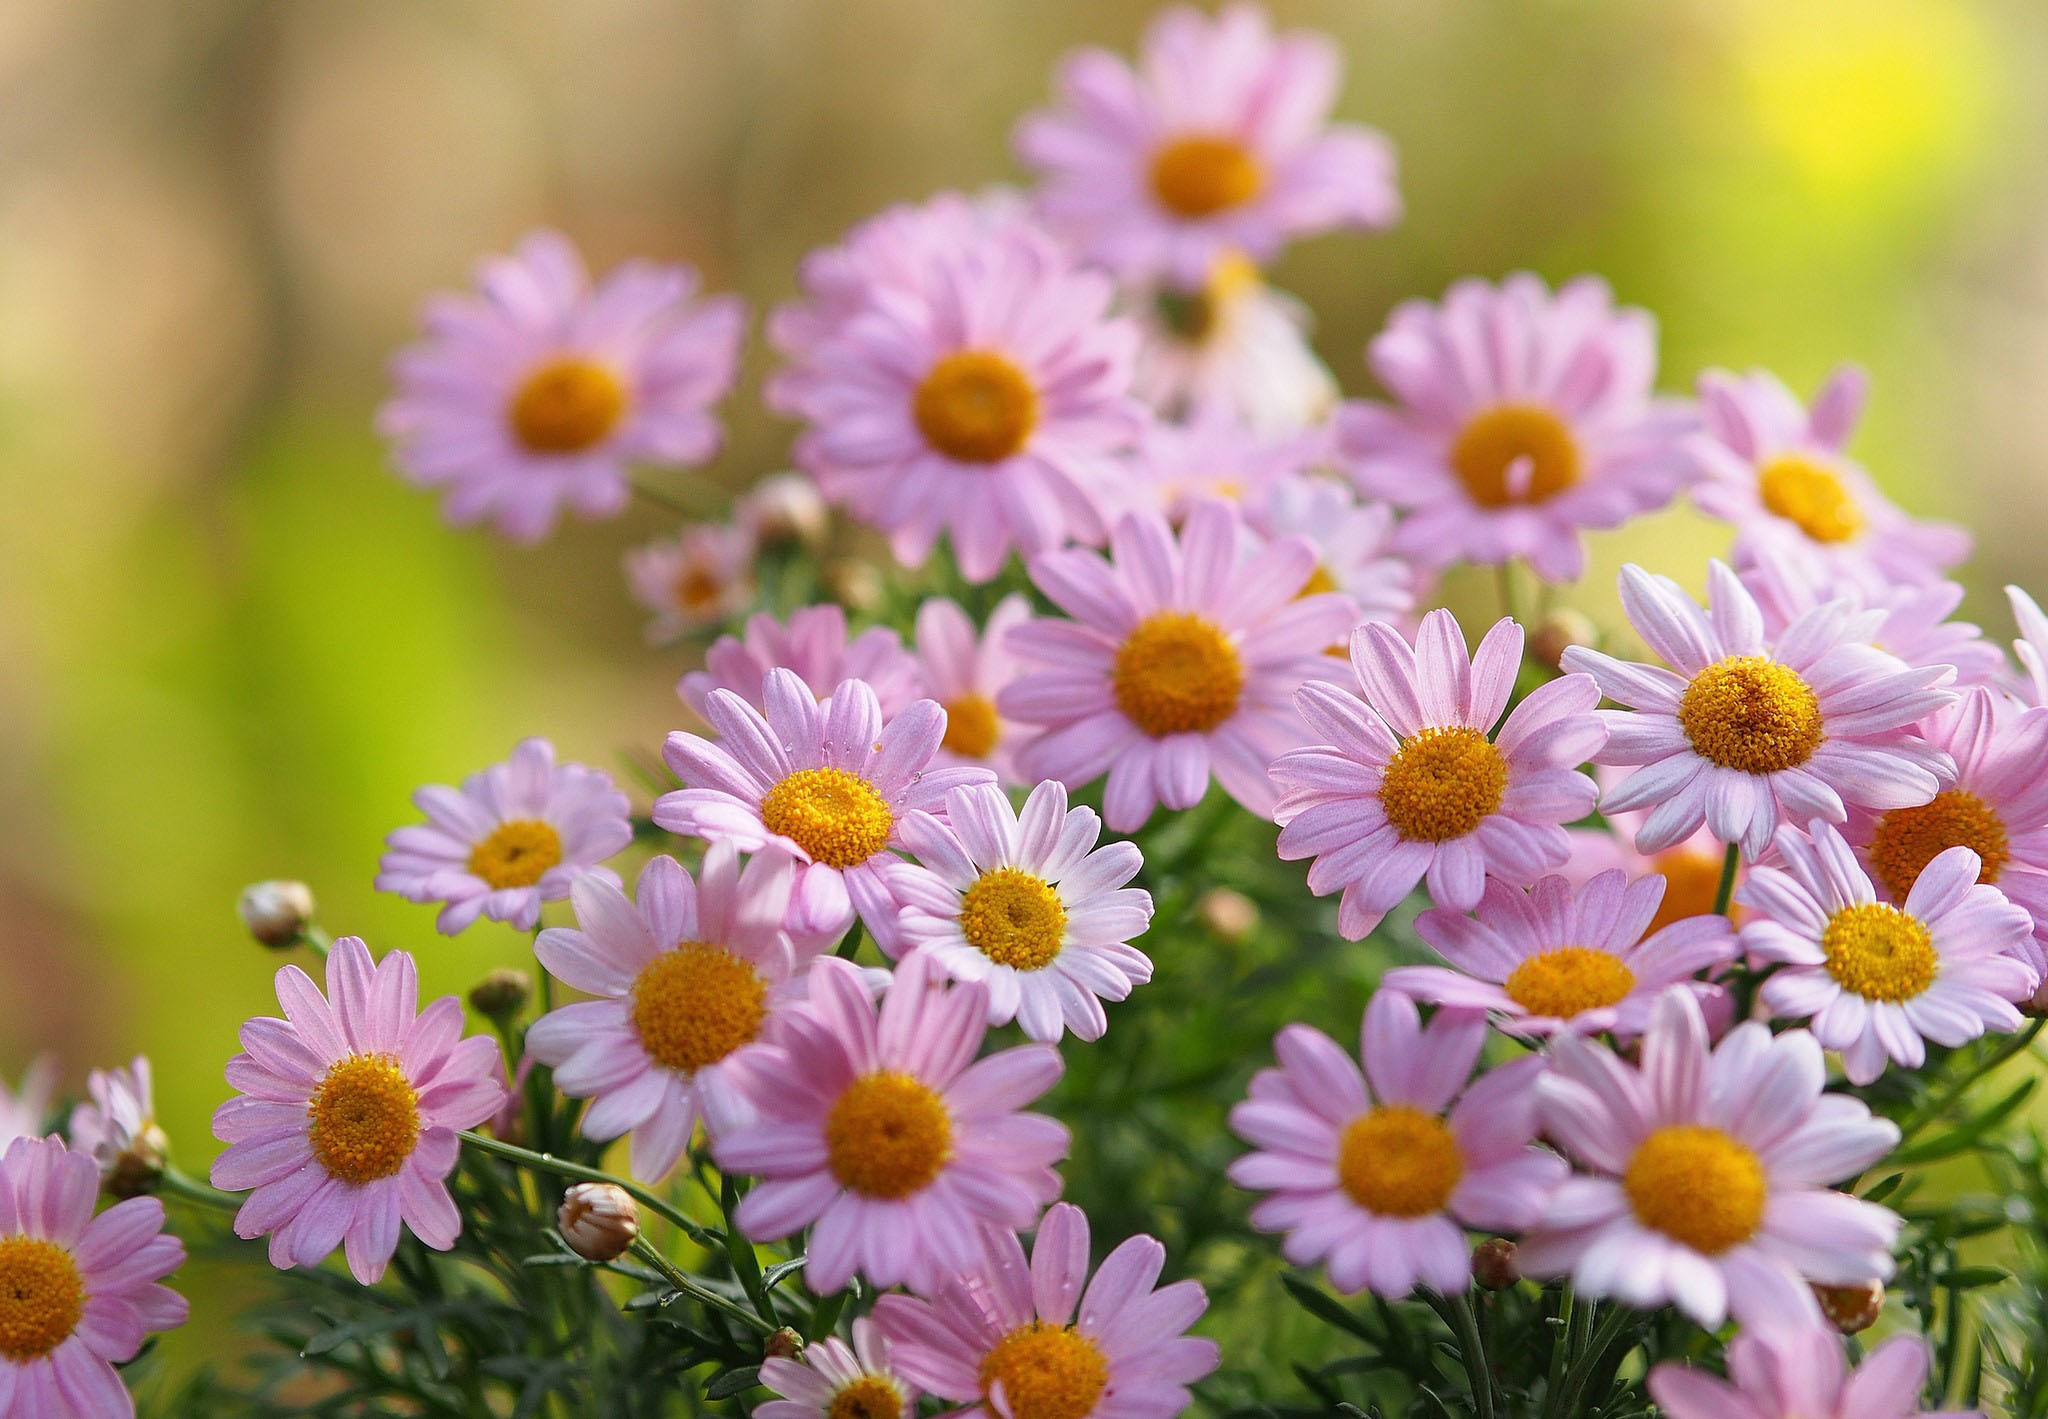 ромашки розовые белые chamomile pink white  № 1037988 без смс